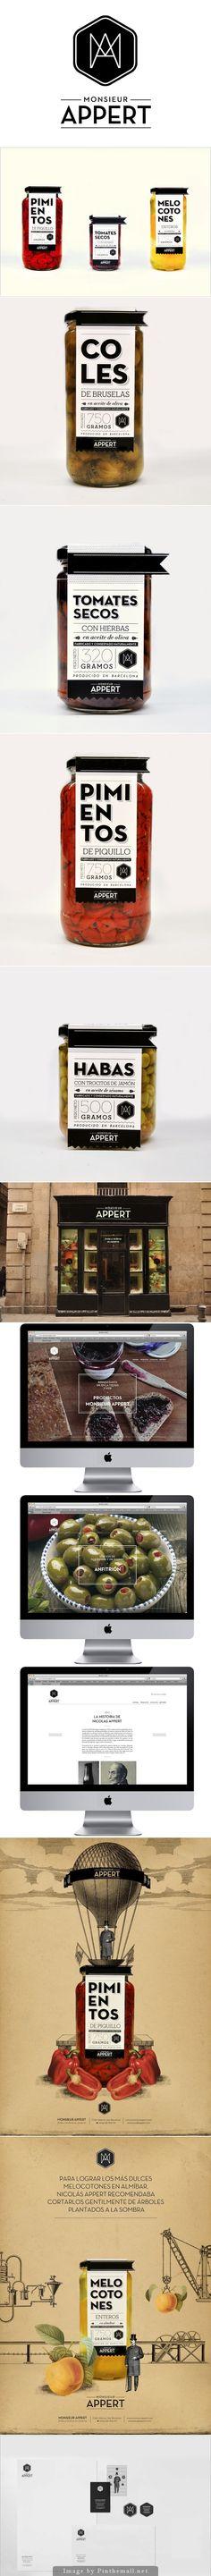 Yummy Monsieur Appert preserved fruit and vegetables identity, packaging, branding curated by Packaging Diva PD created via https://www.behance.net/gallery/Monsieur-Appert/3694165